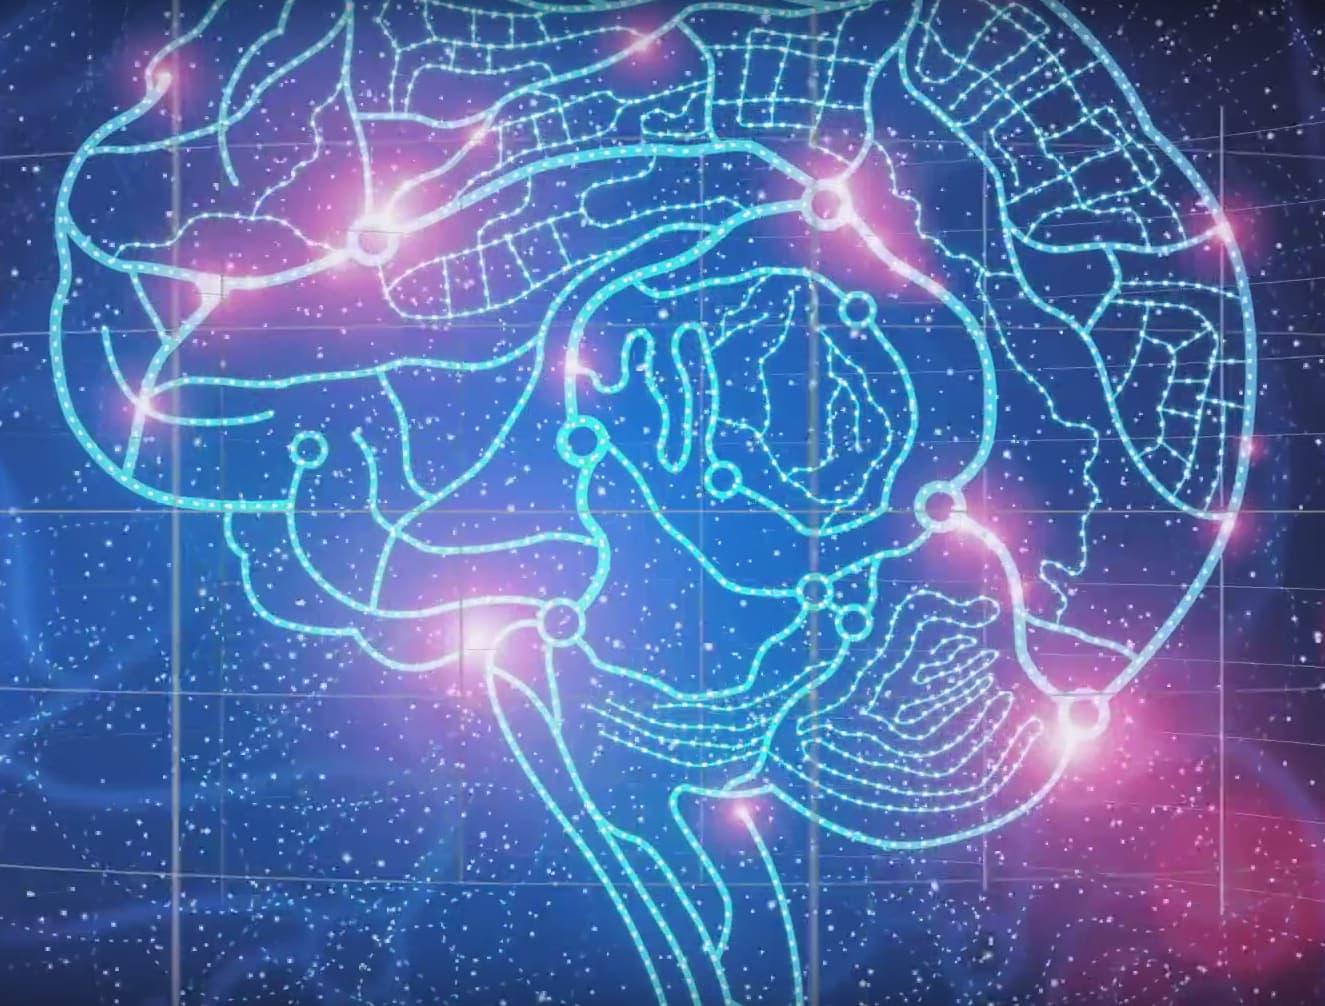 3D Atlas of the human brain